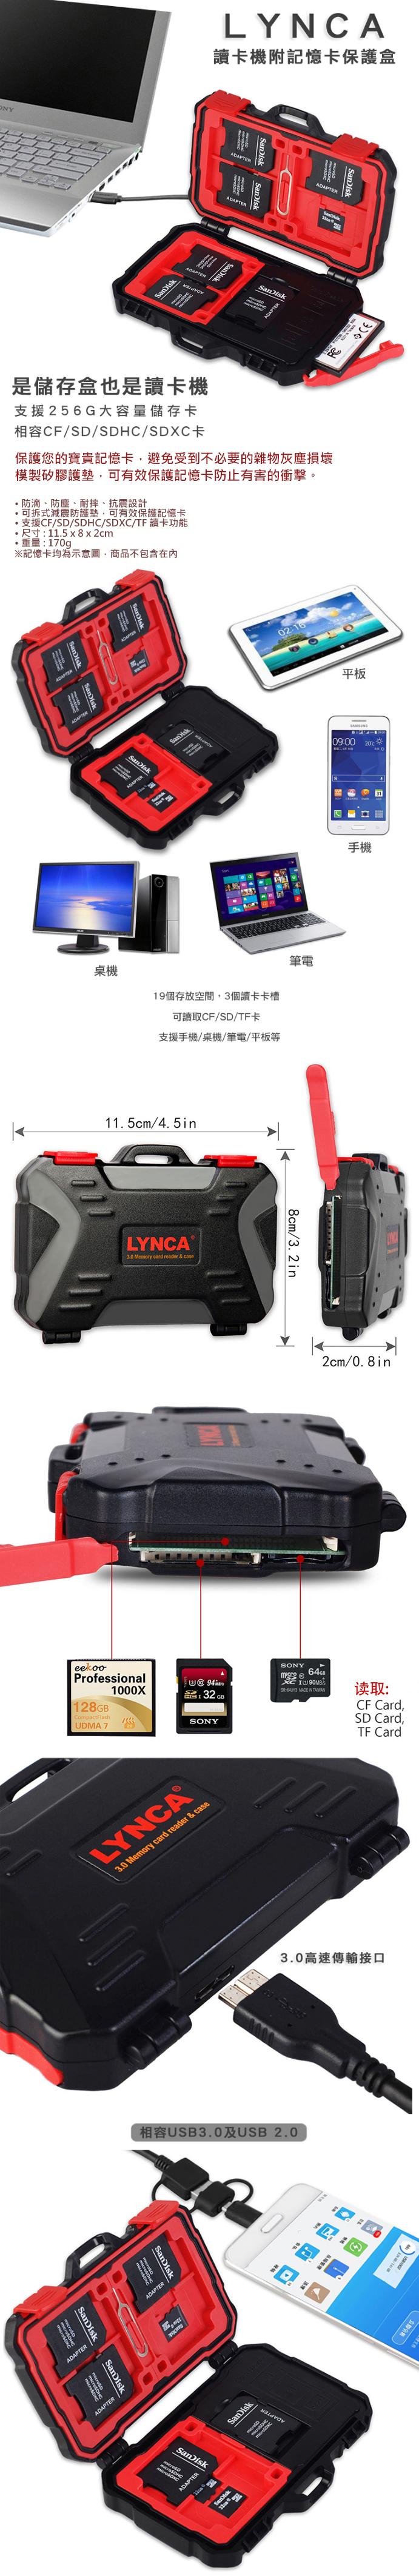 lynca015.jpg